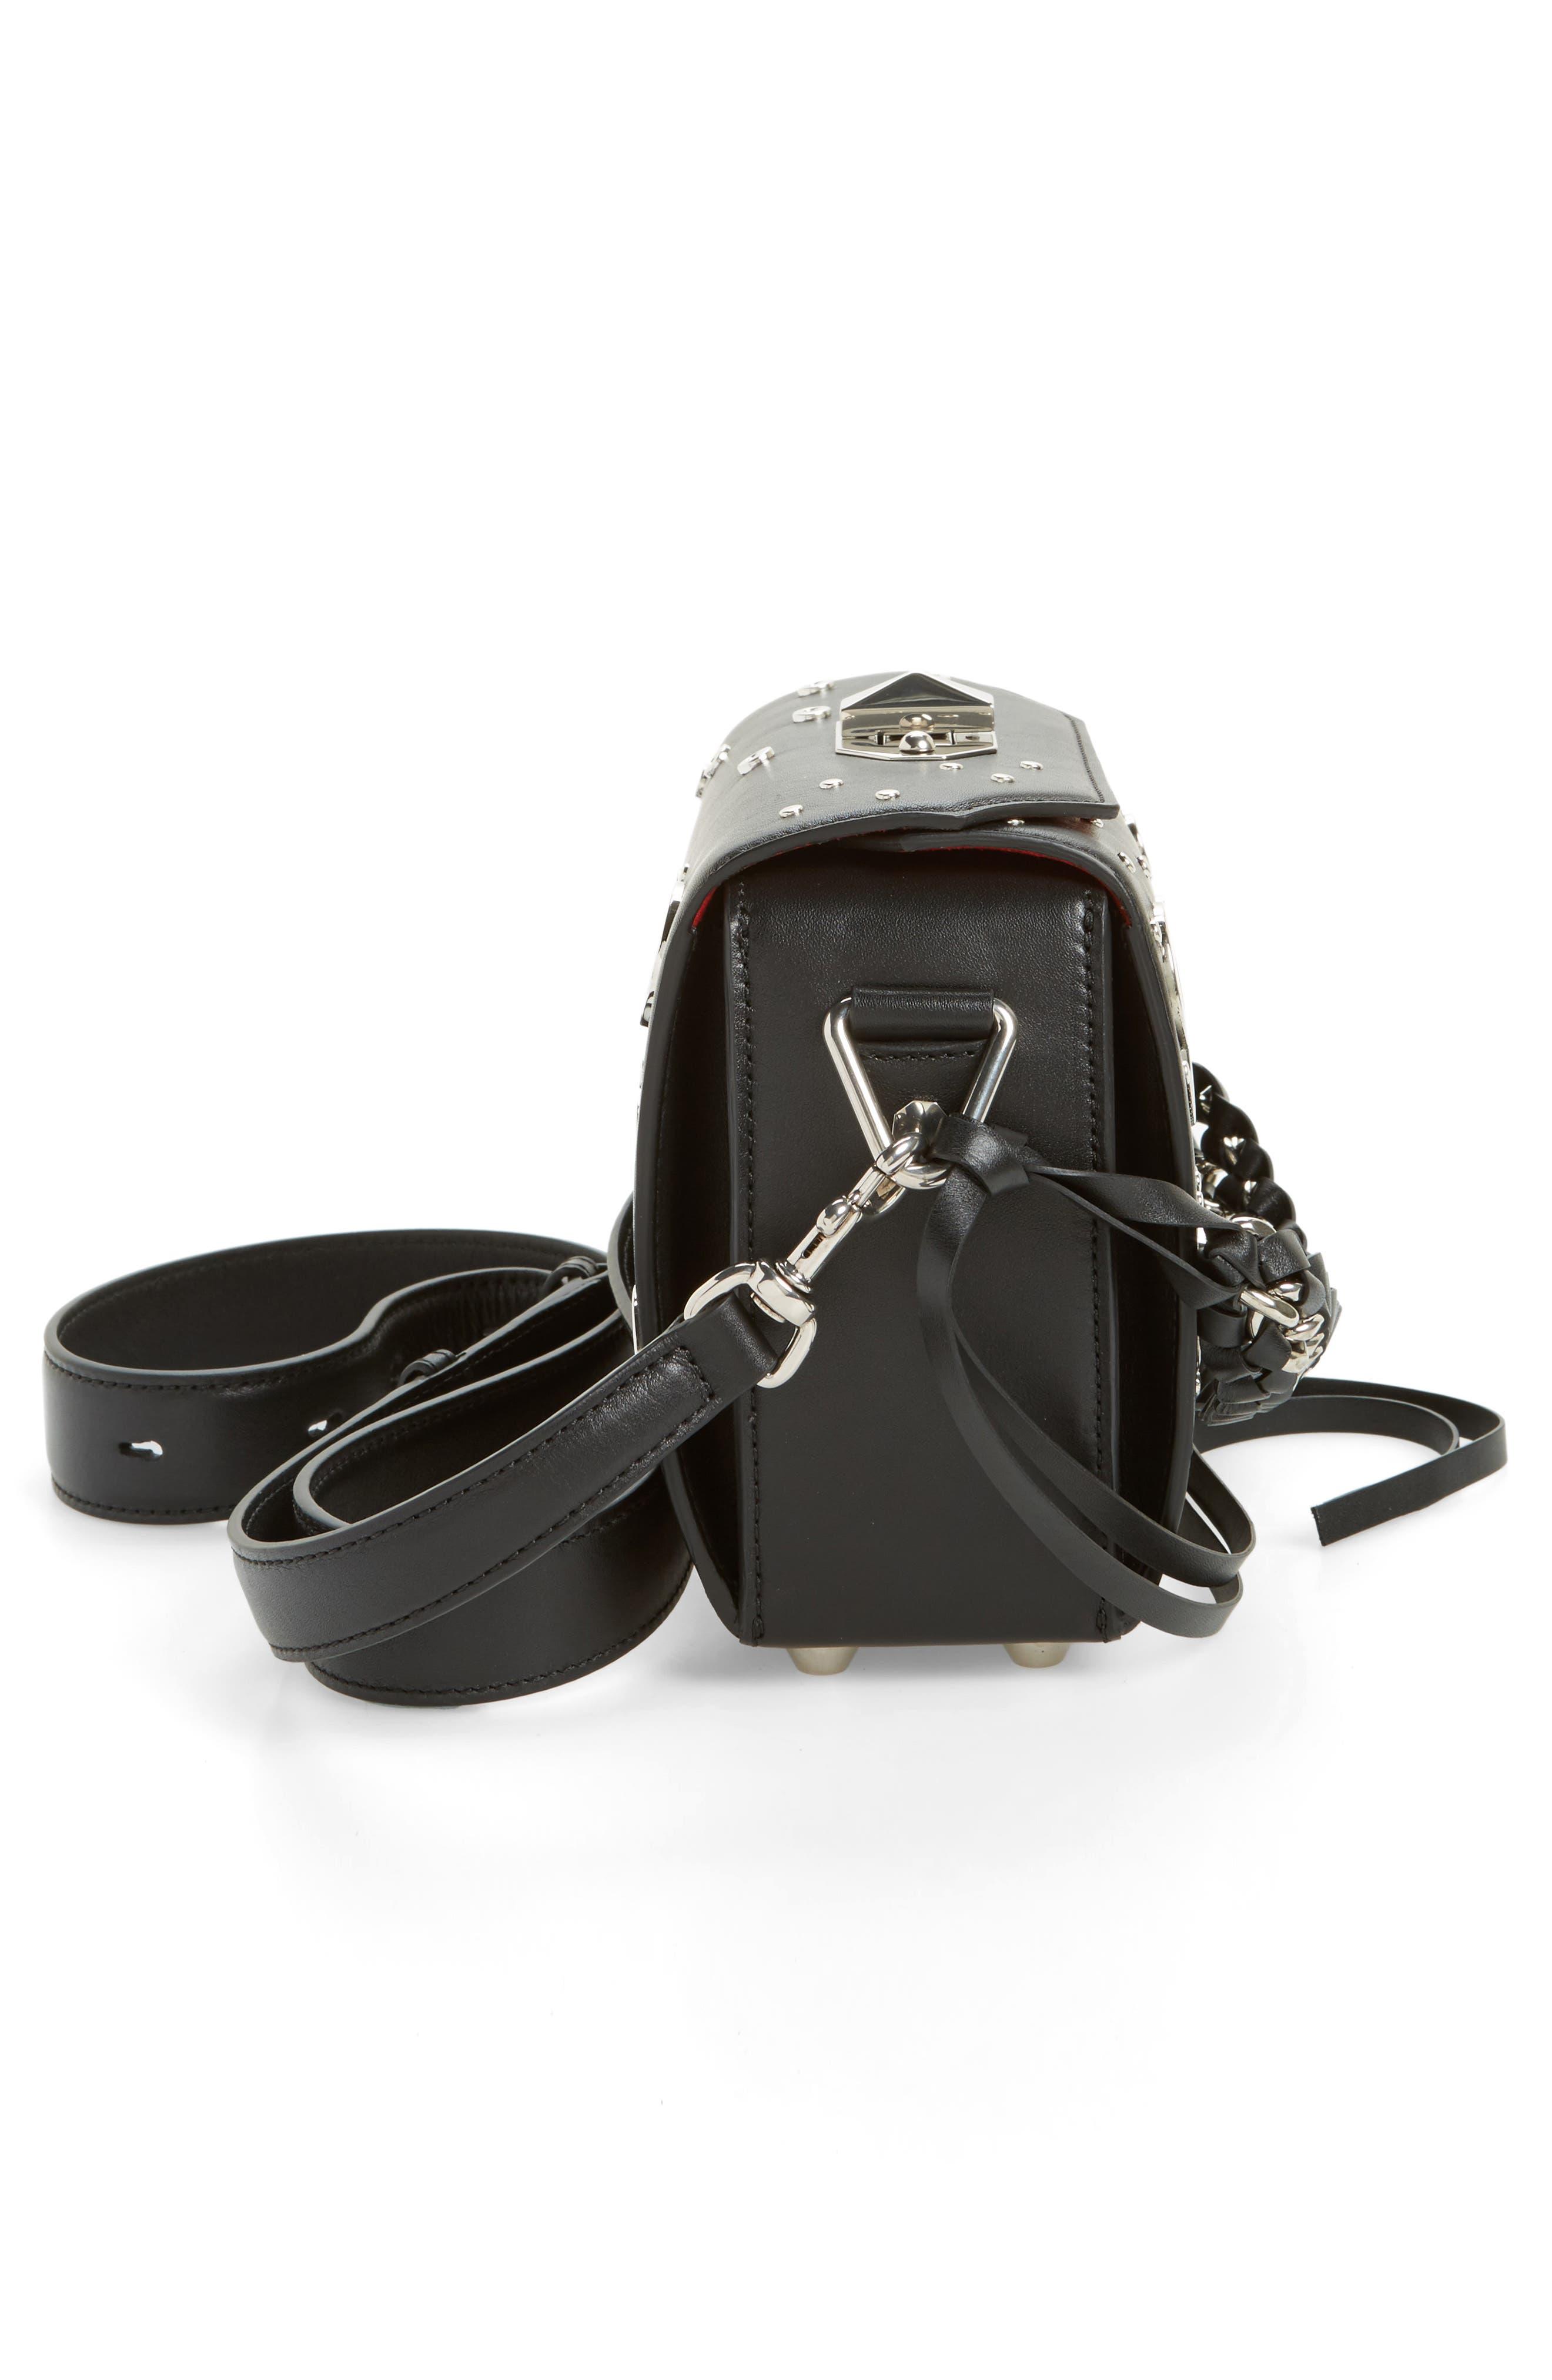 Grommet & Stud Calfskin Leather Box Bag,                             Alternate thumbnail 5, color,                             001